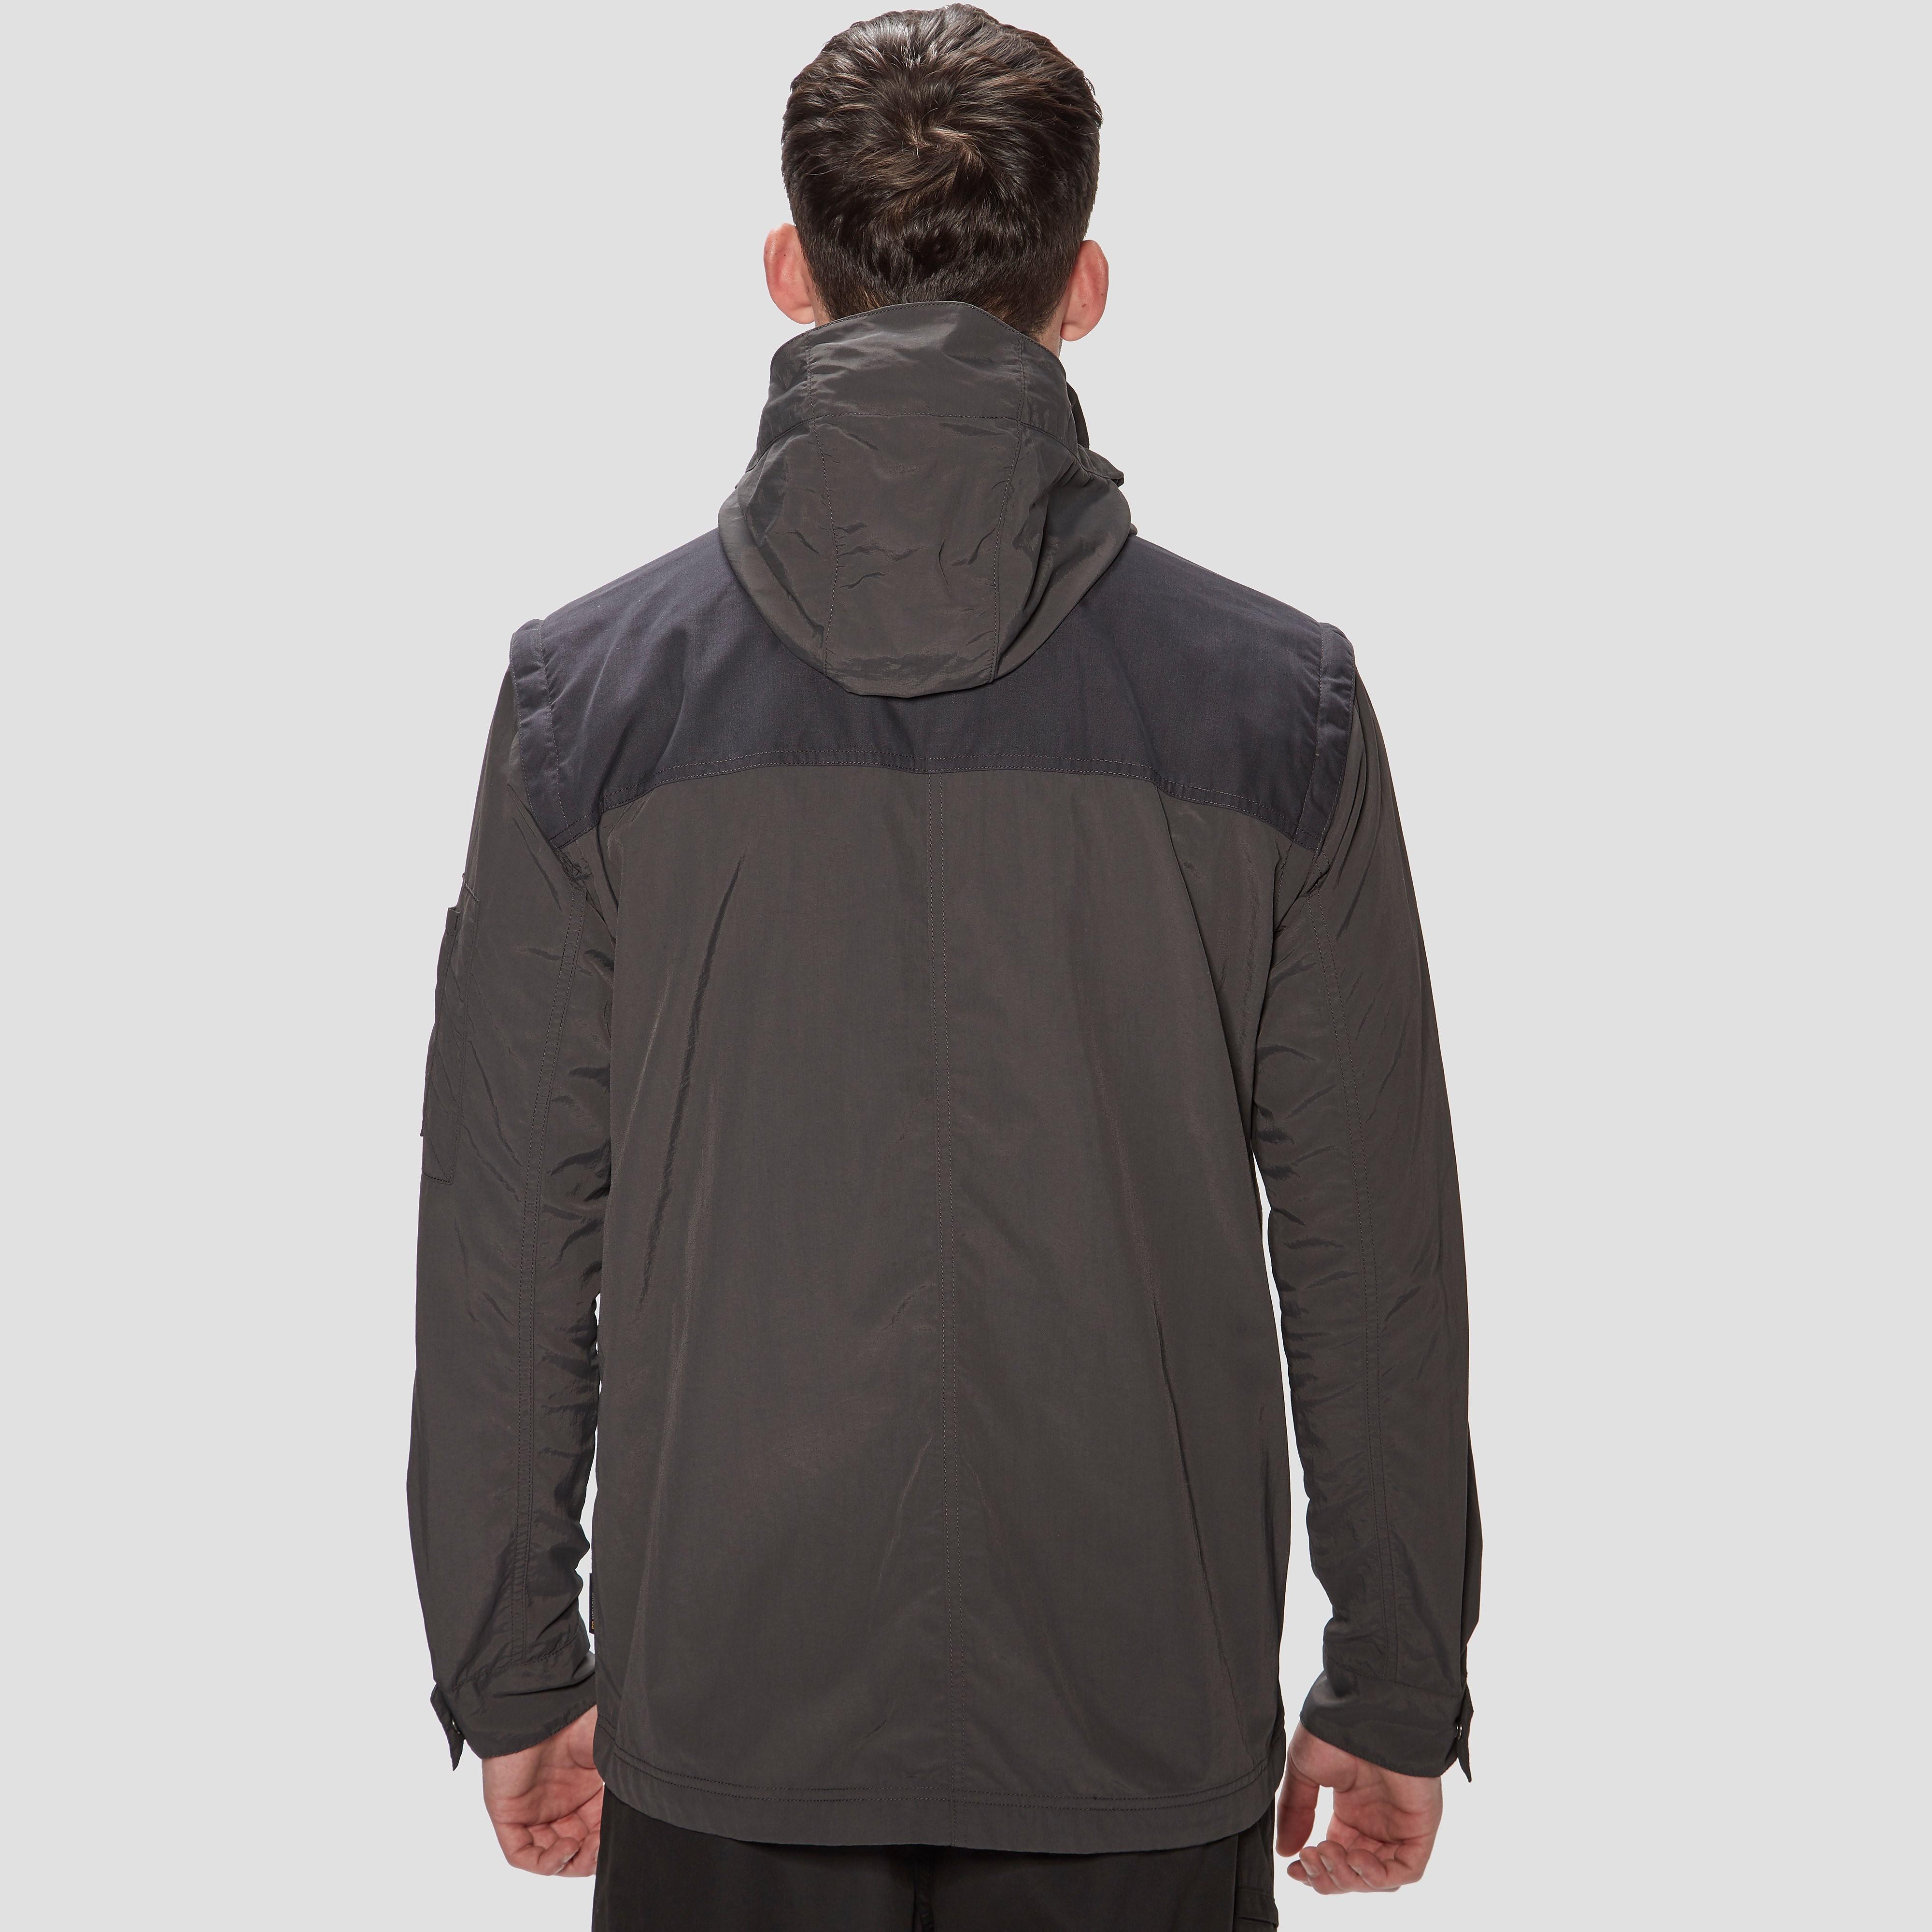 Jack Wolfskin Atacama Men's Jacket